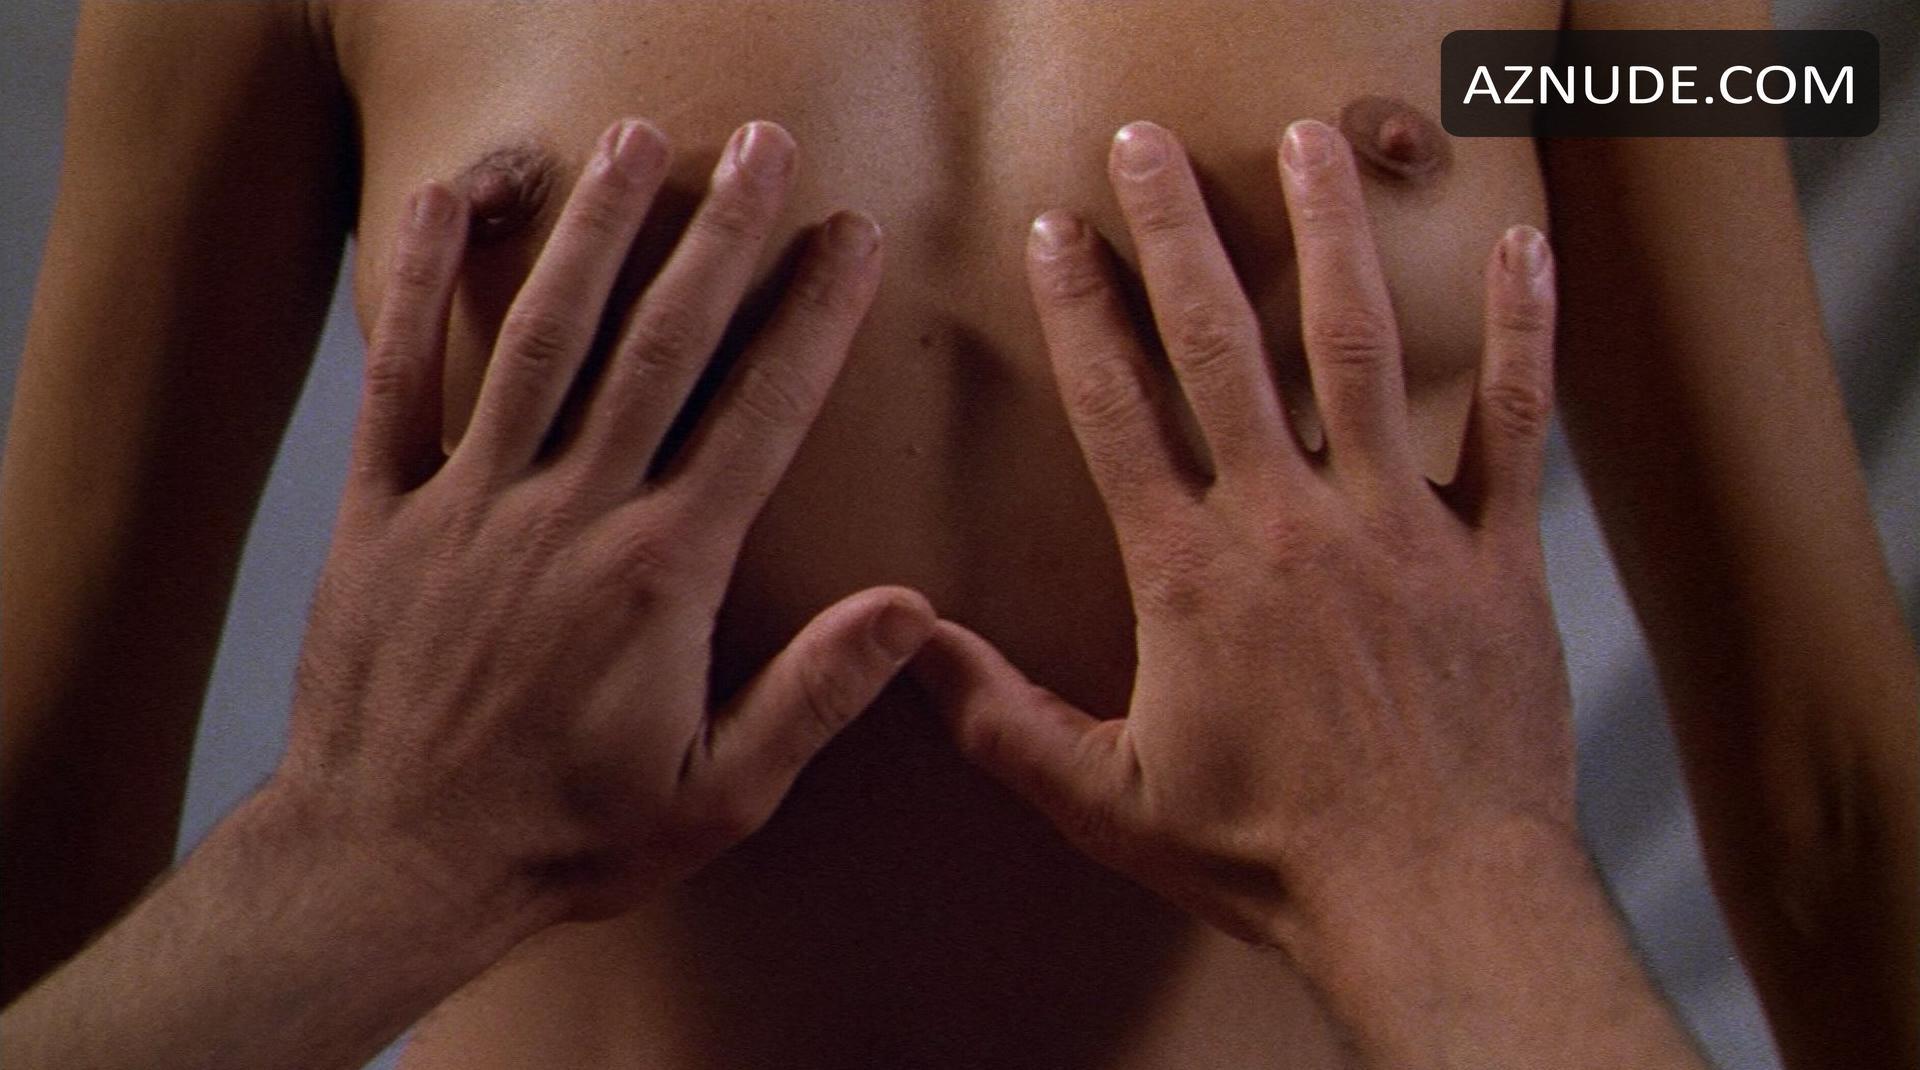 American gigolo nude pic